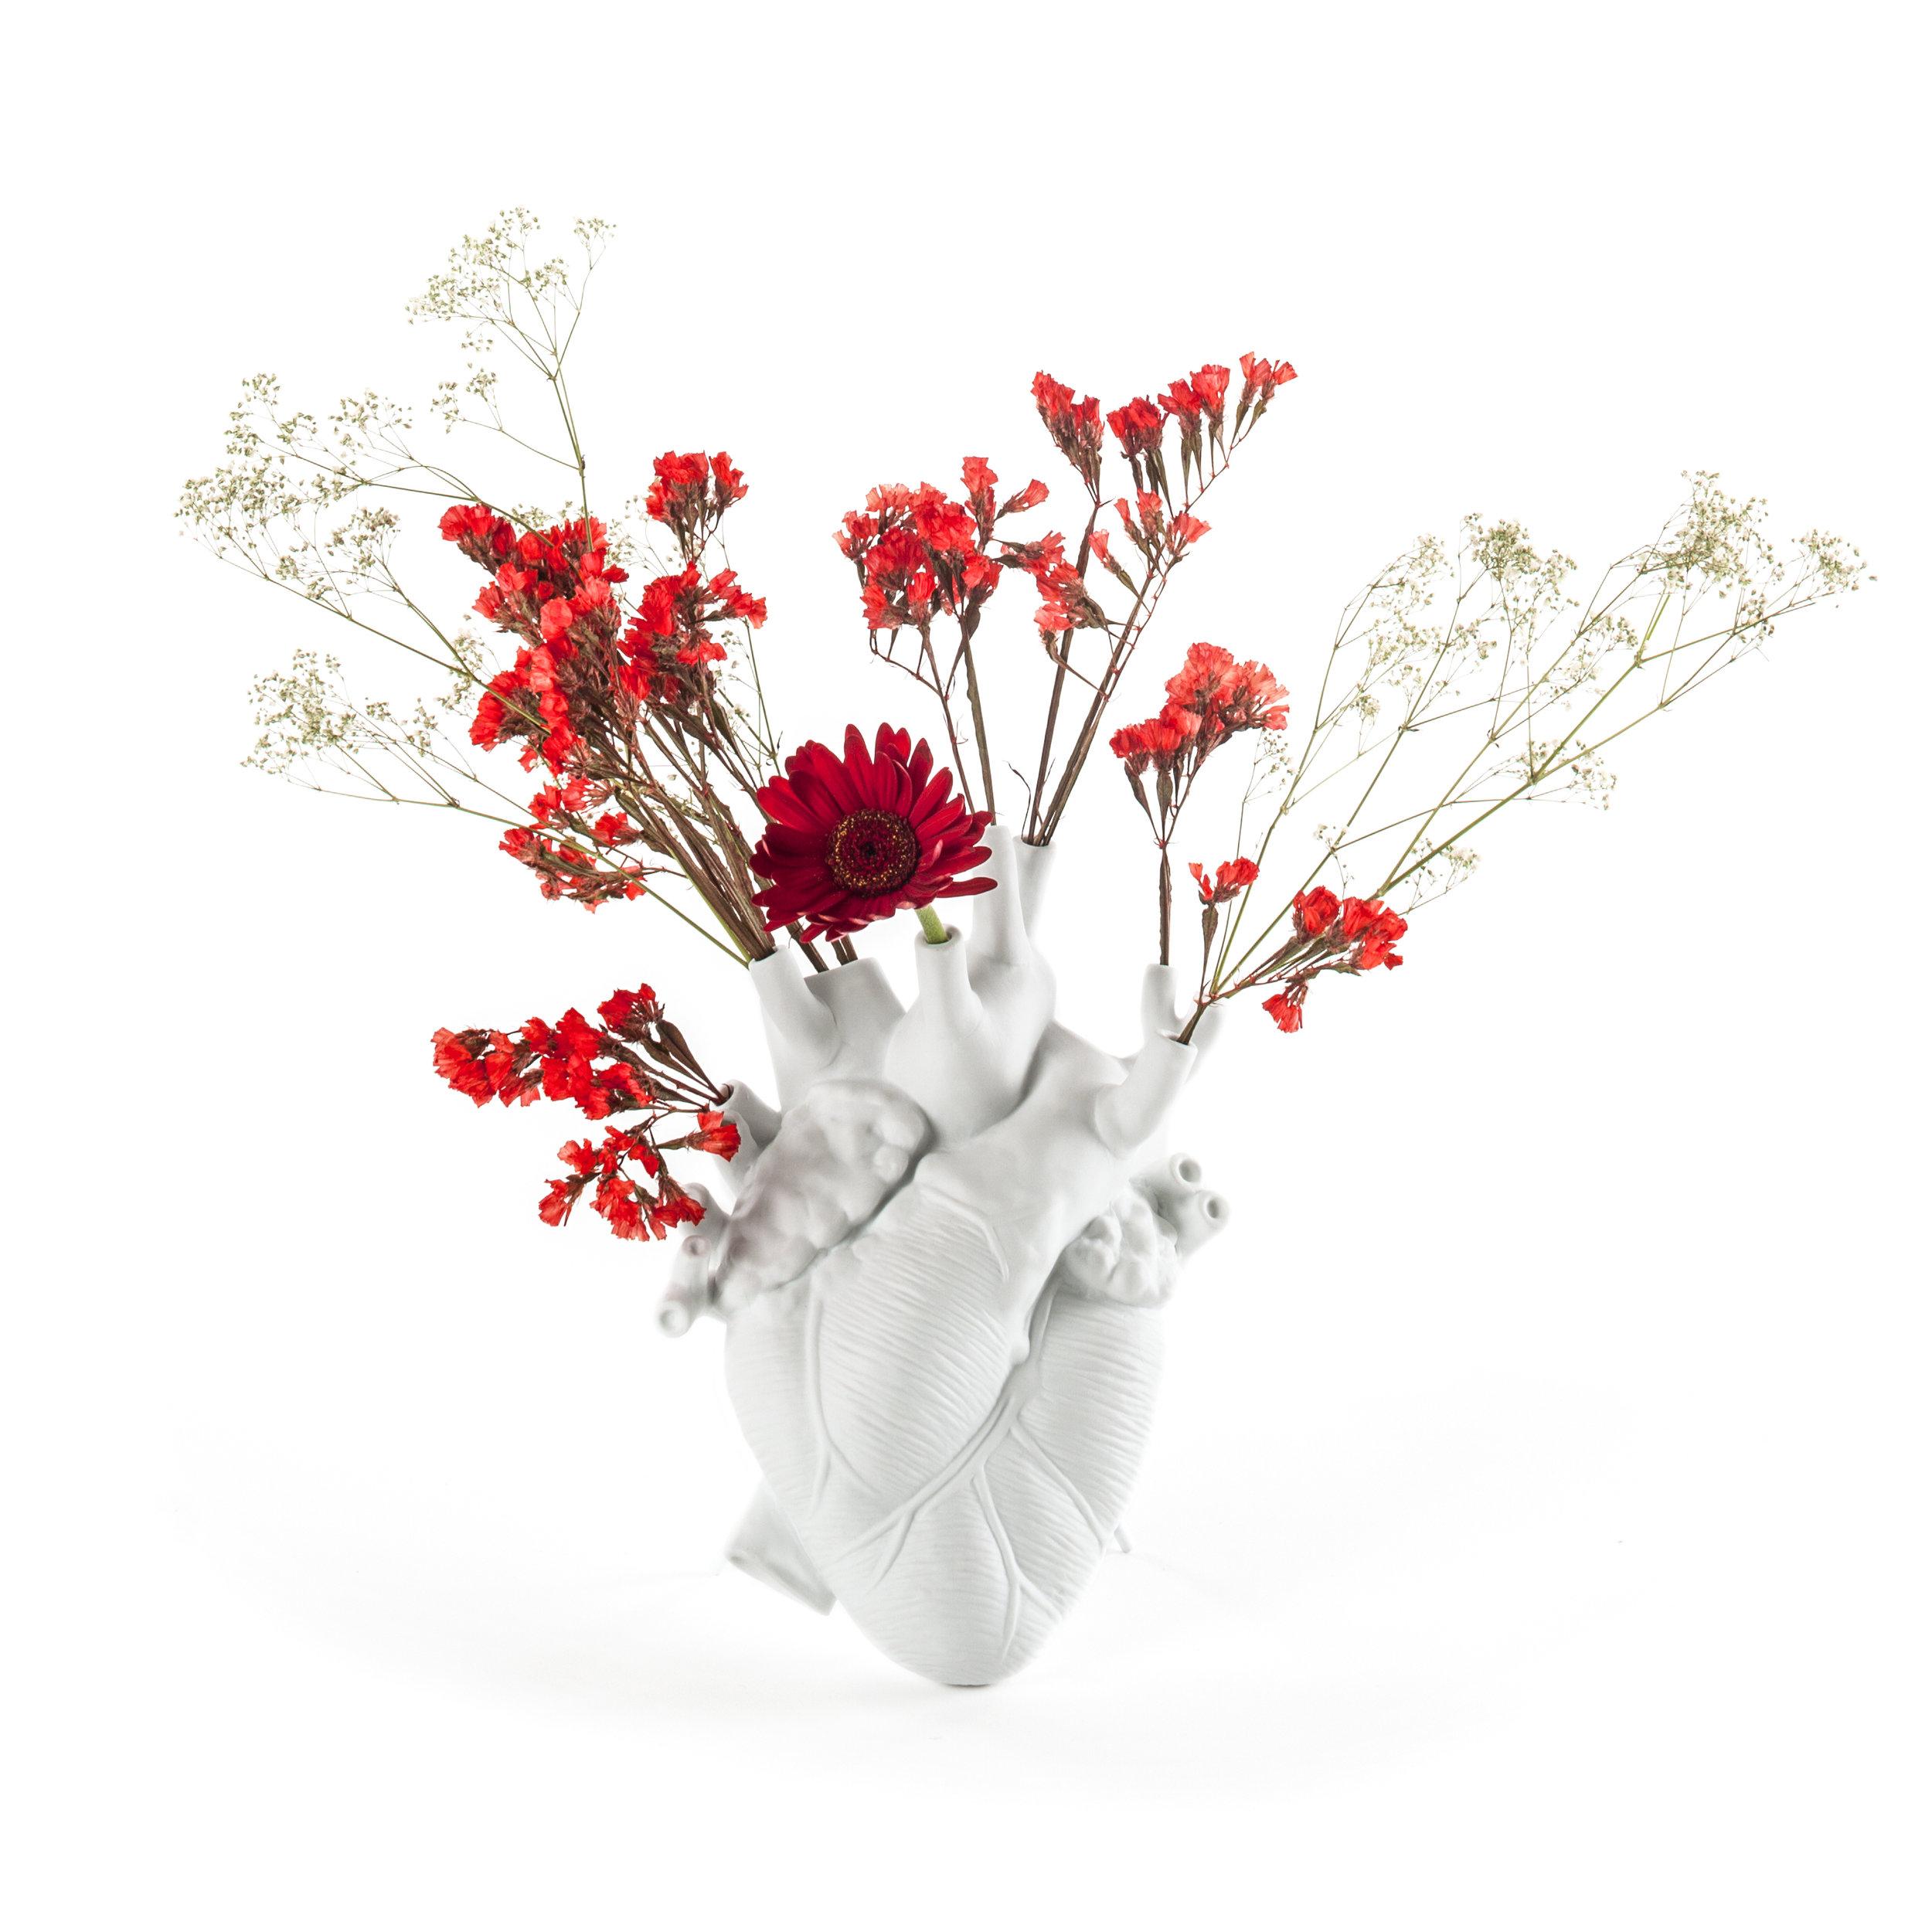 09920_Love in Bloom-Seletti (7).jpg